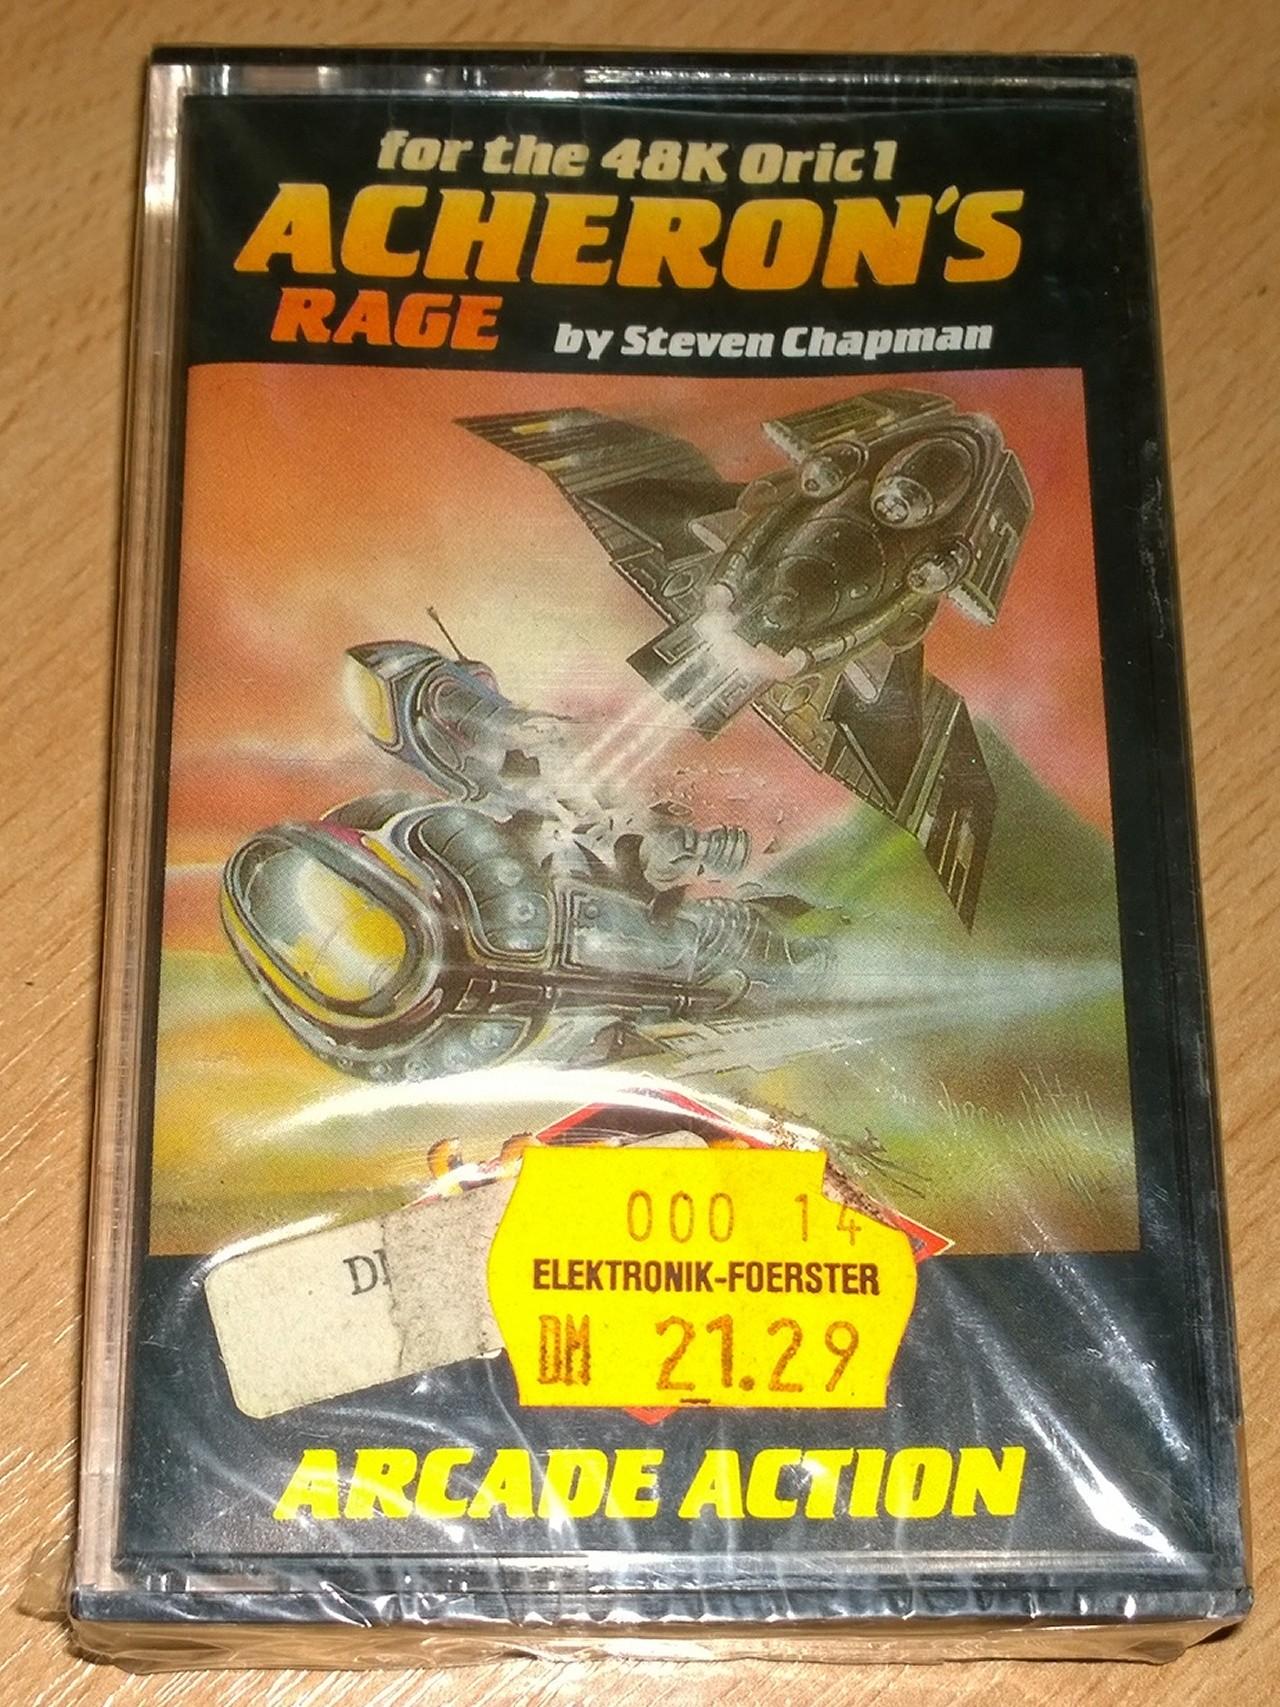 Acheron's Rage - Oric - Softek - NOS